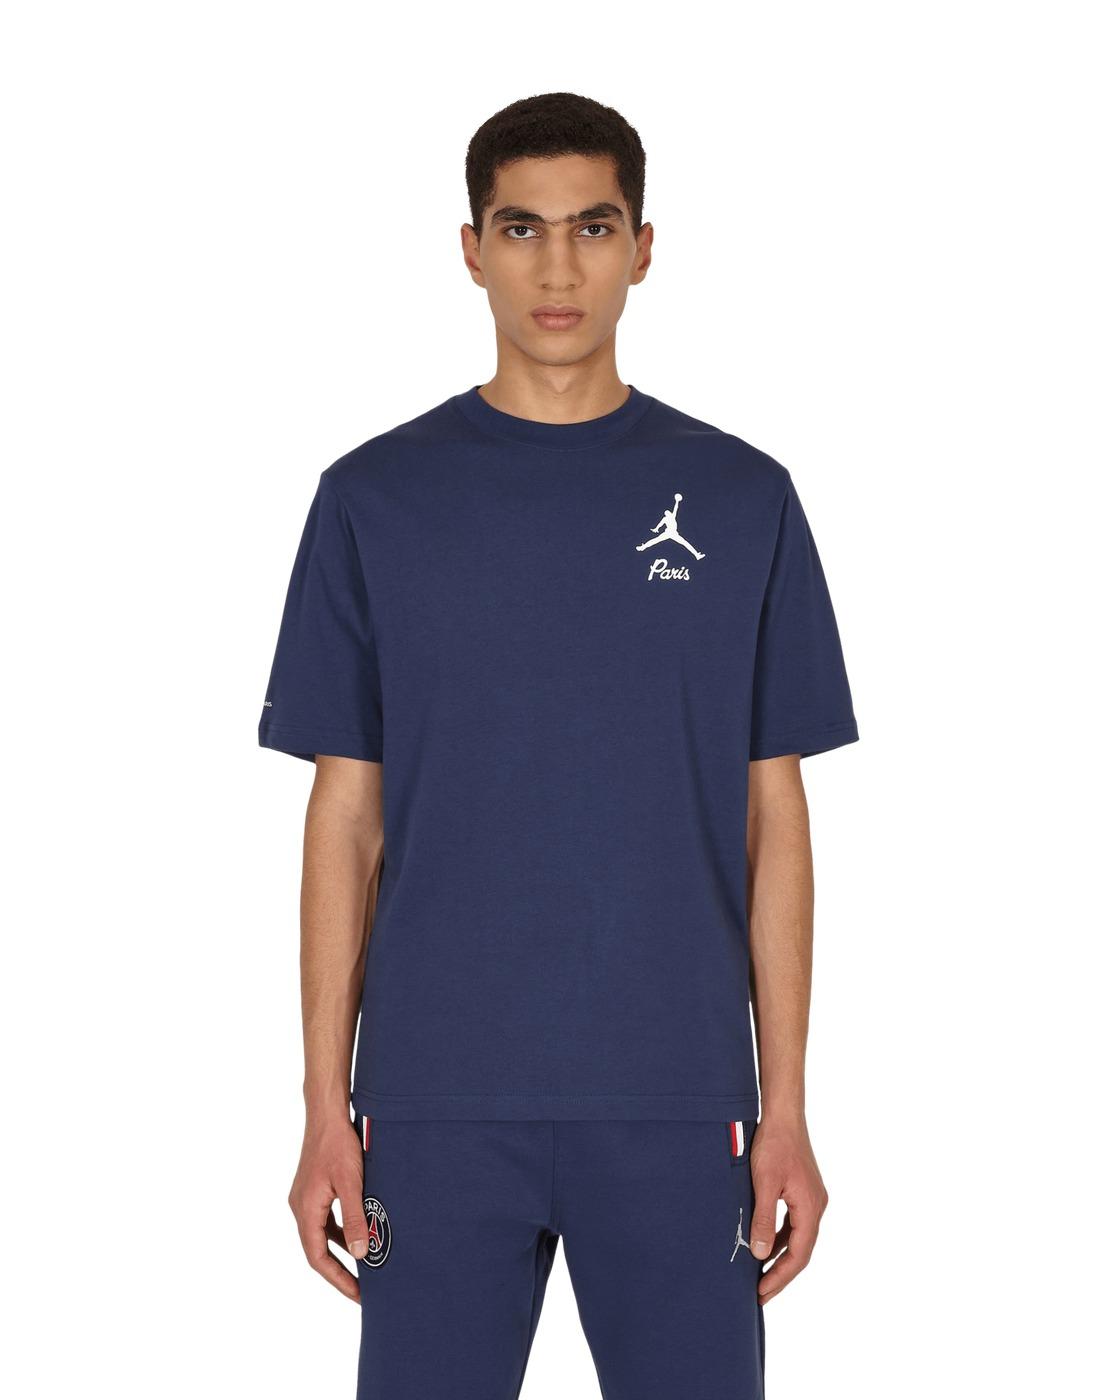 Photo: Nike Jordan Paris Saint Germain T Shirt Midnight Navy